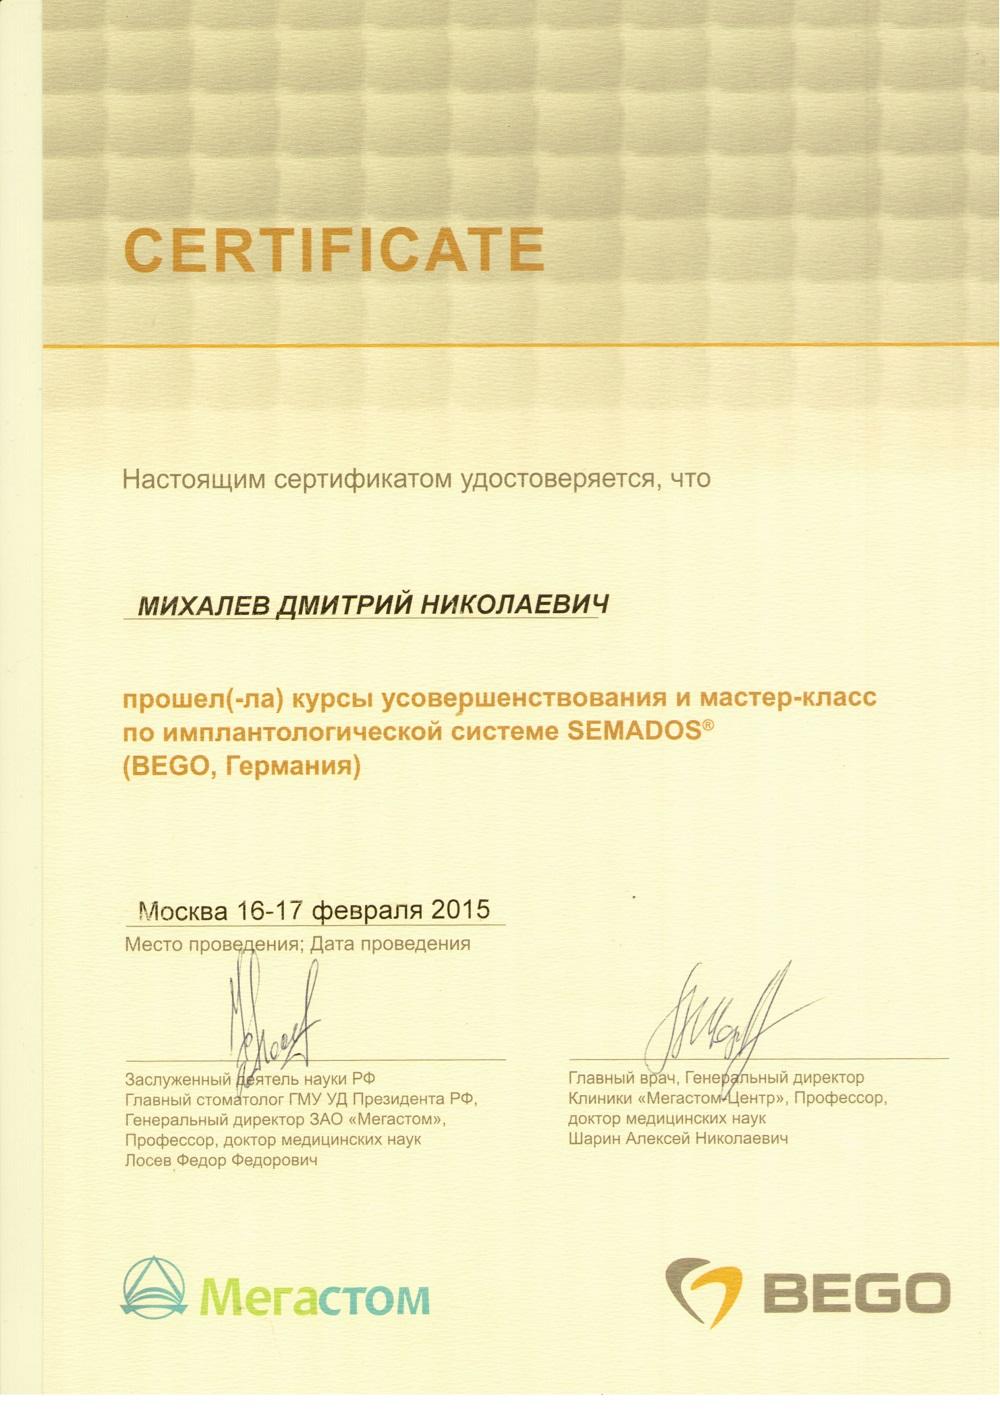 Сертификат Bego